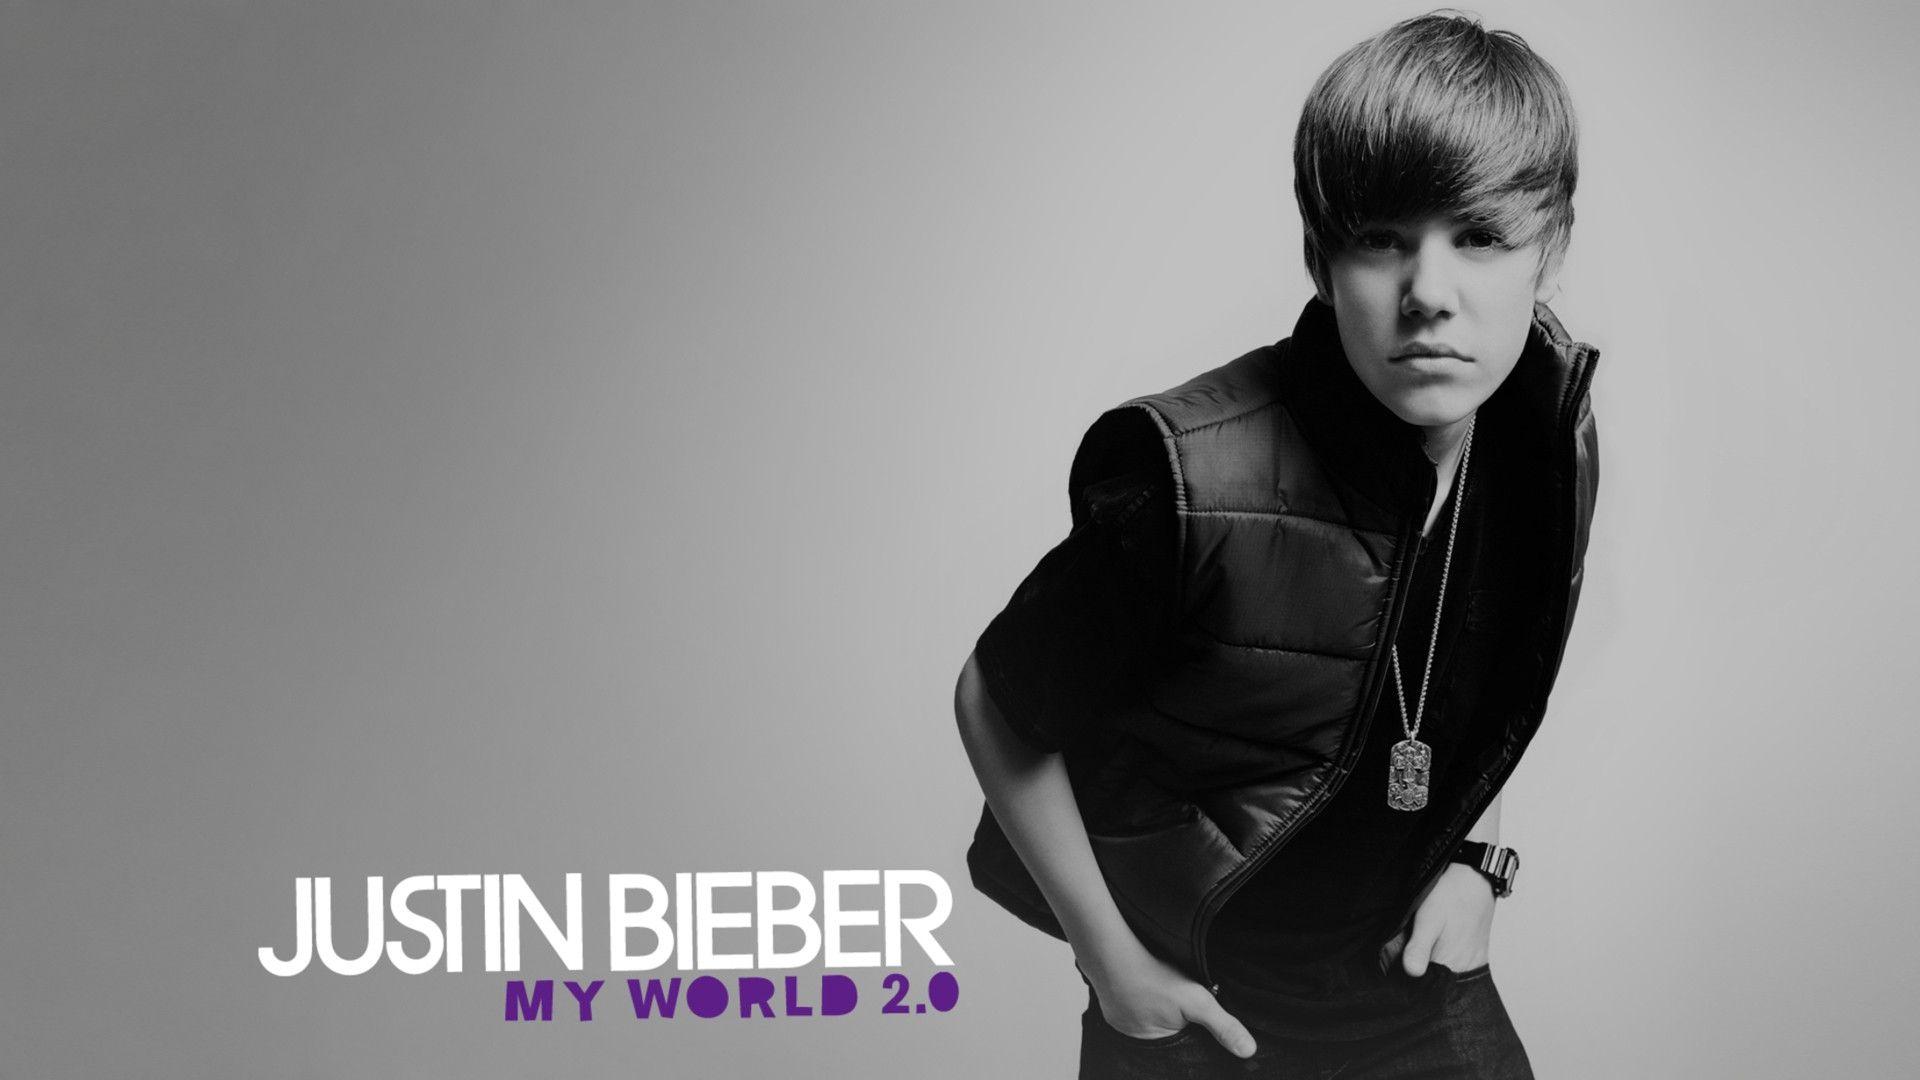 Justin Bieber Wallpaper Download Sf Wallpaper